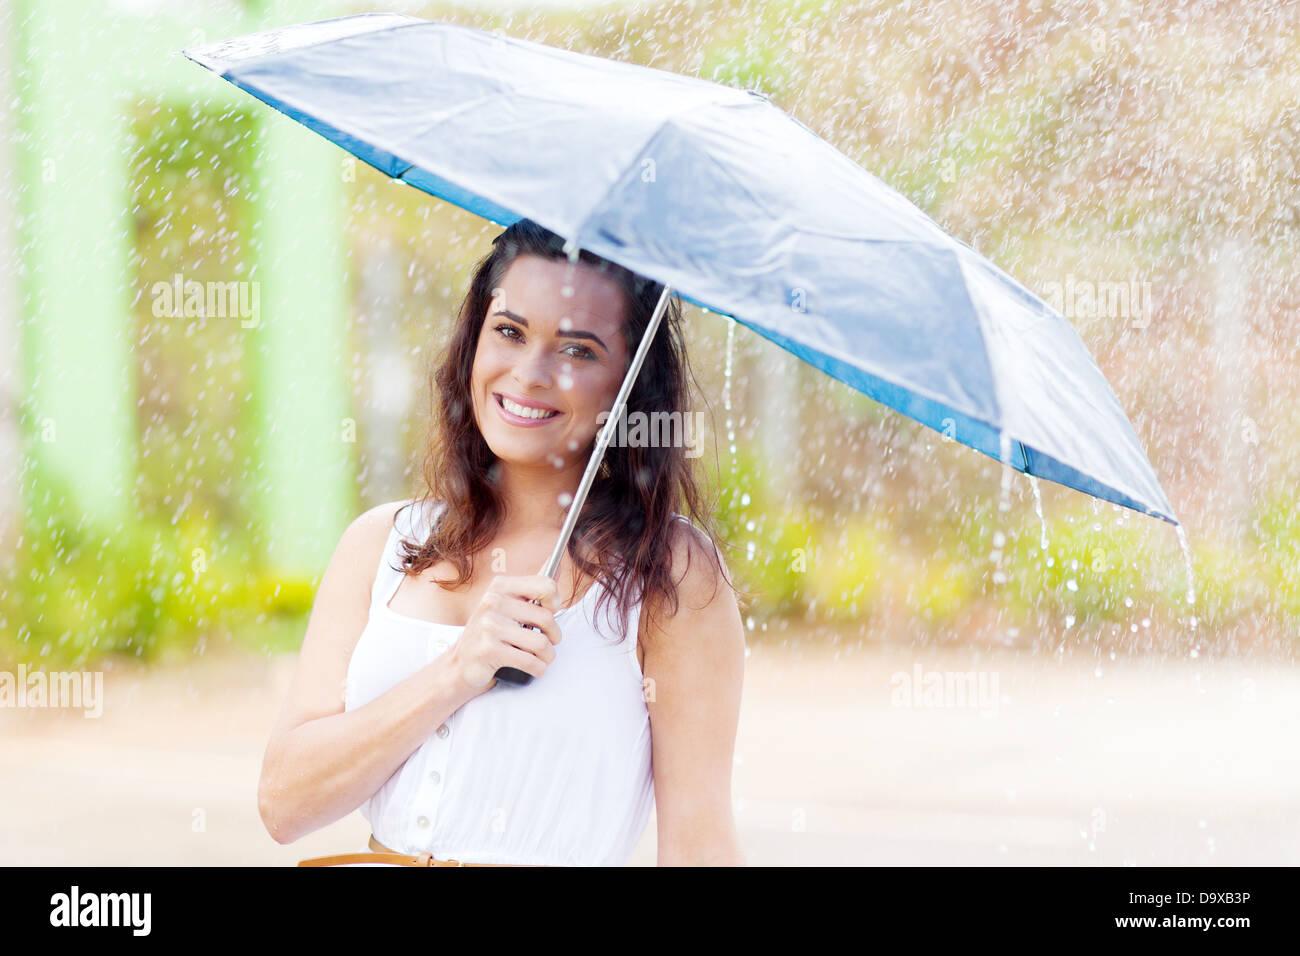 pretty young woman in the rain with umbrella - Stock Image